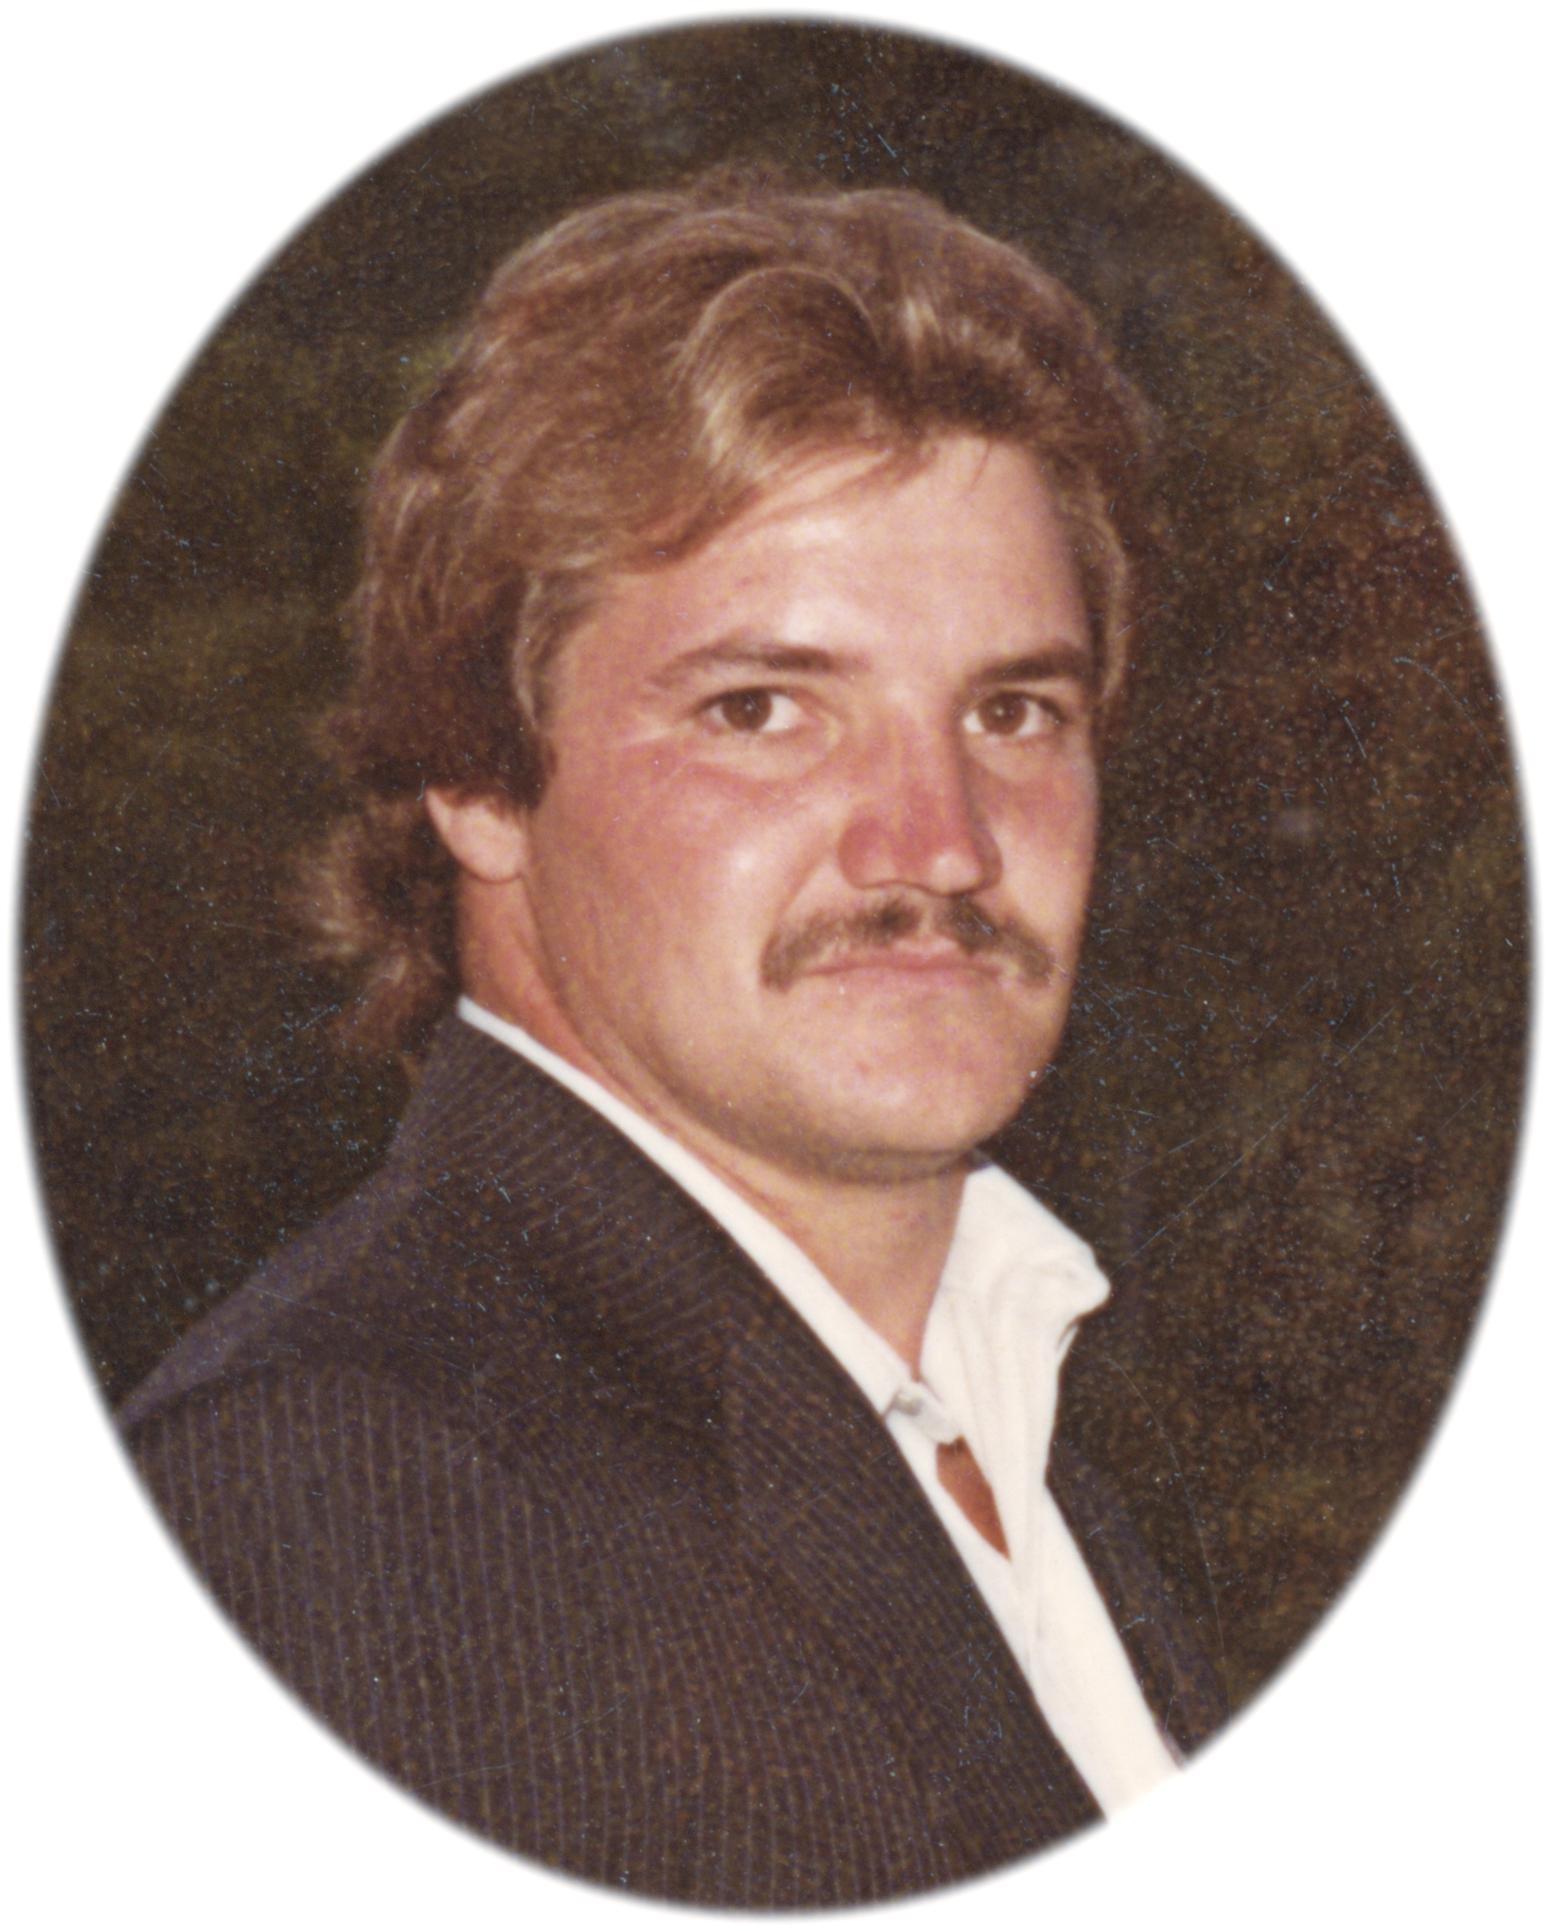 Robert W. Menard